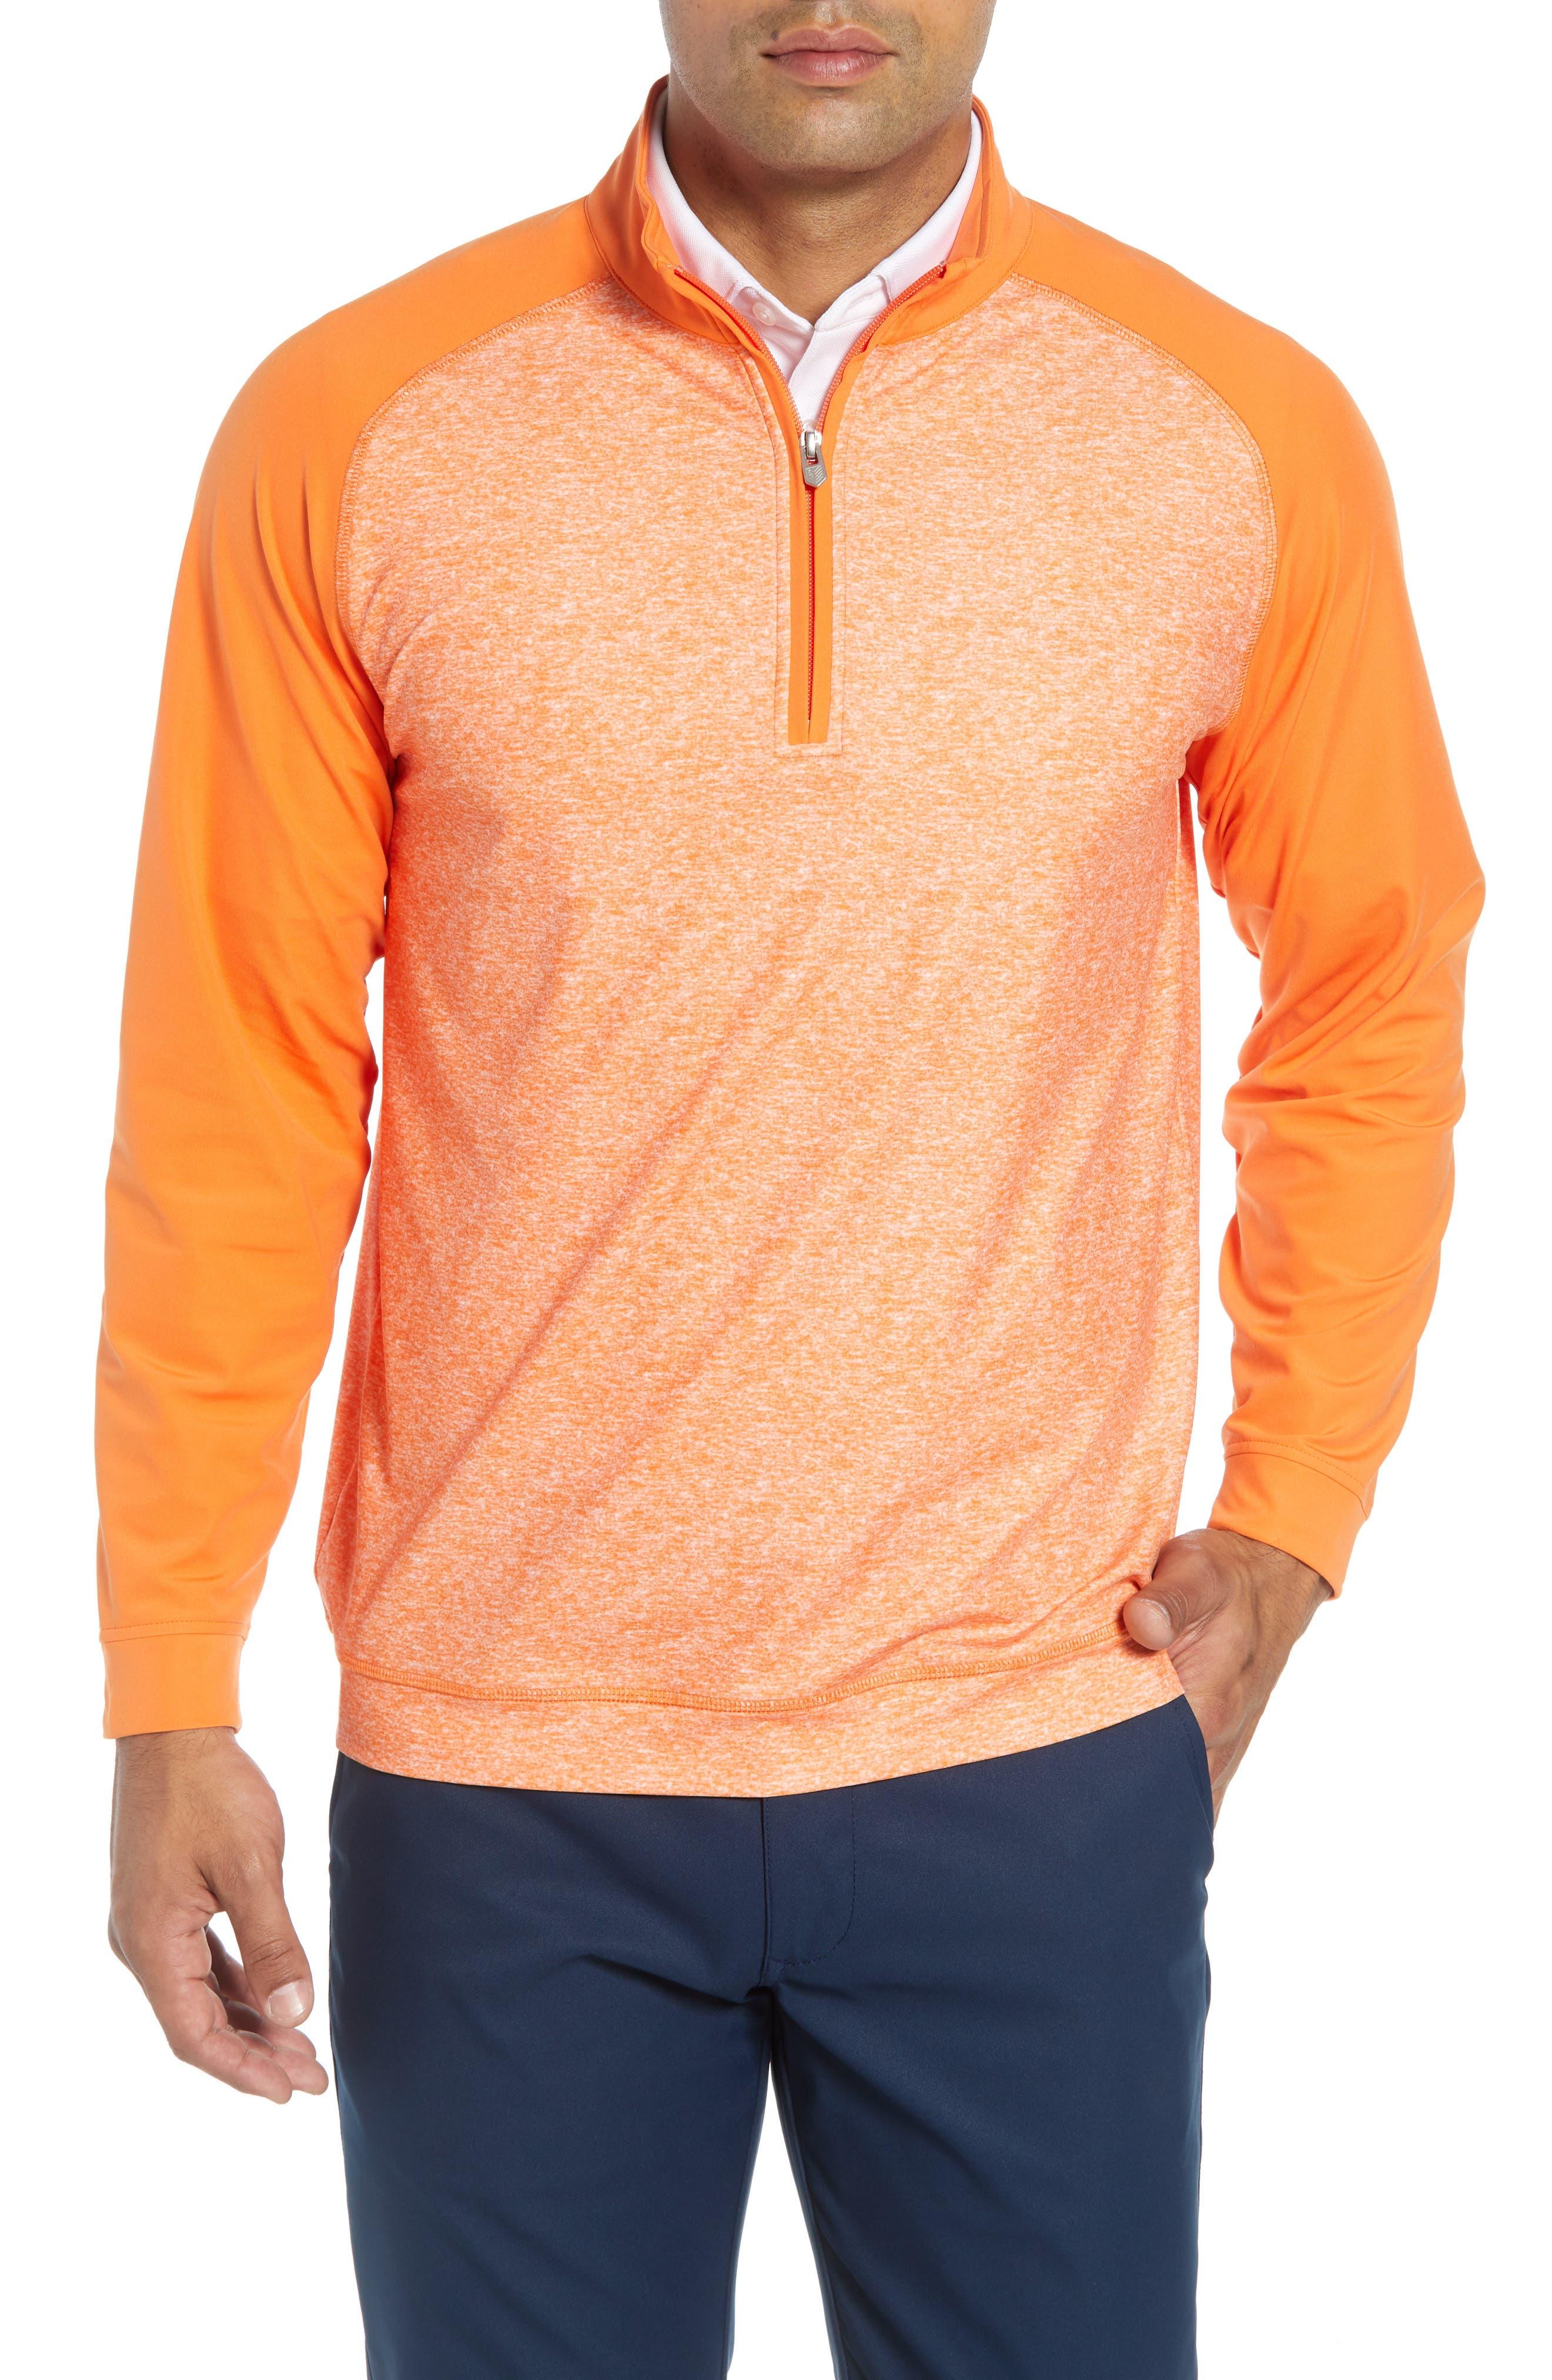 BOBBY JONES Rule 18 Tech Raglan Pullover in Orange